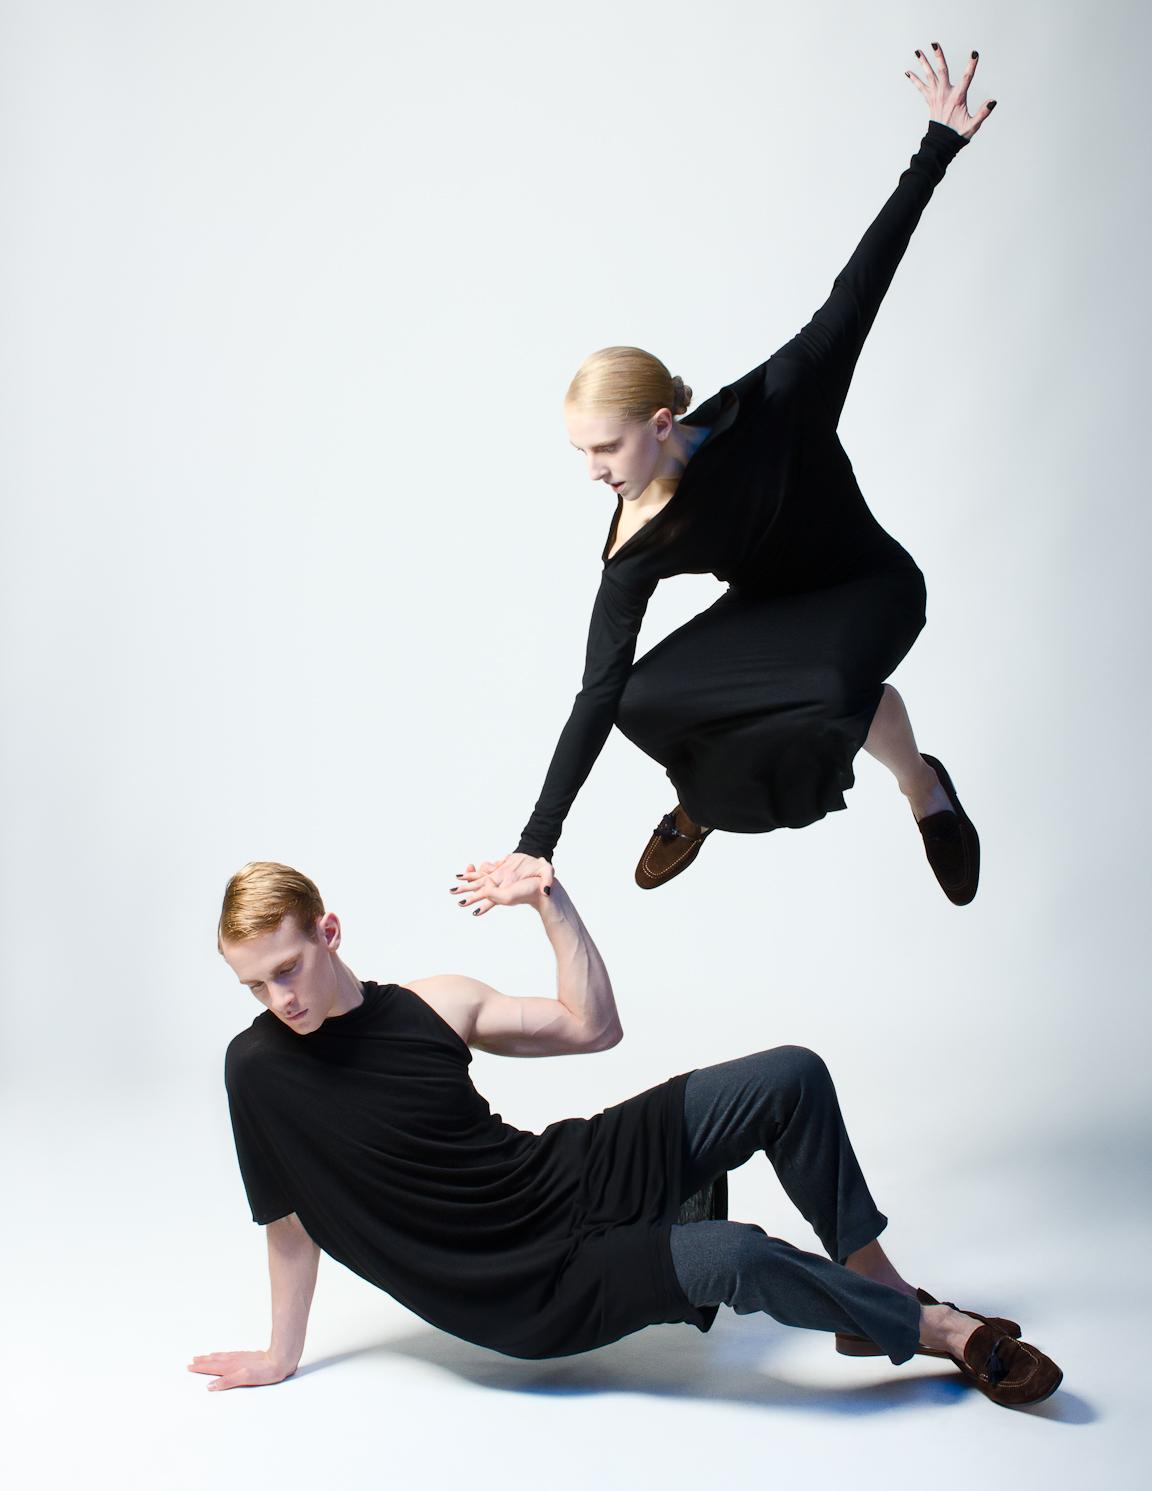 Kyle Froman ballet photography